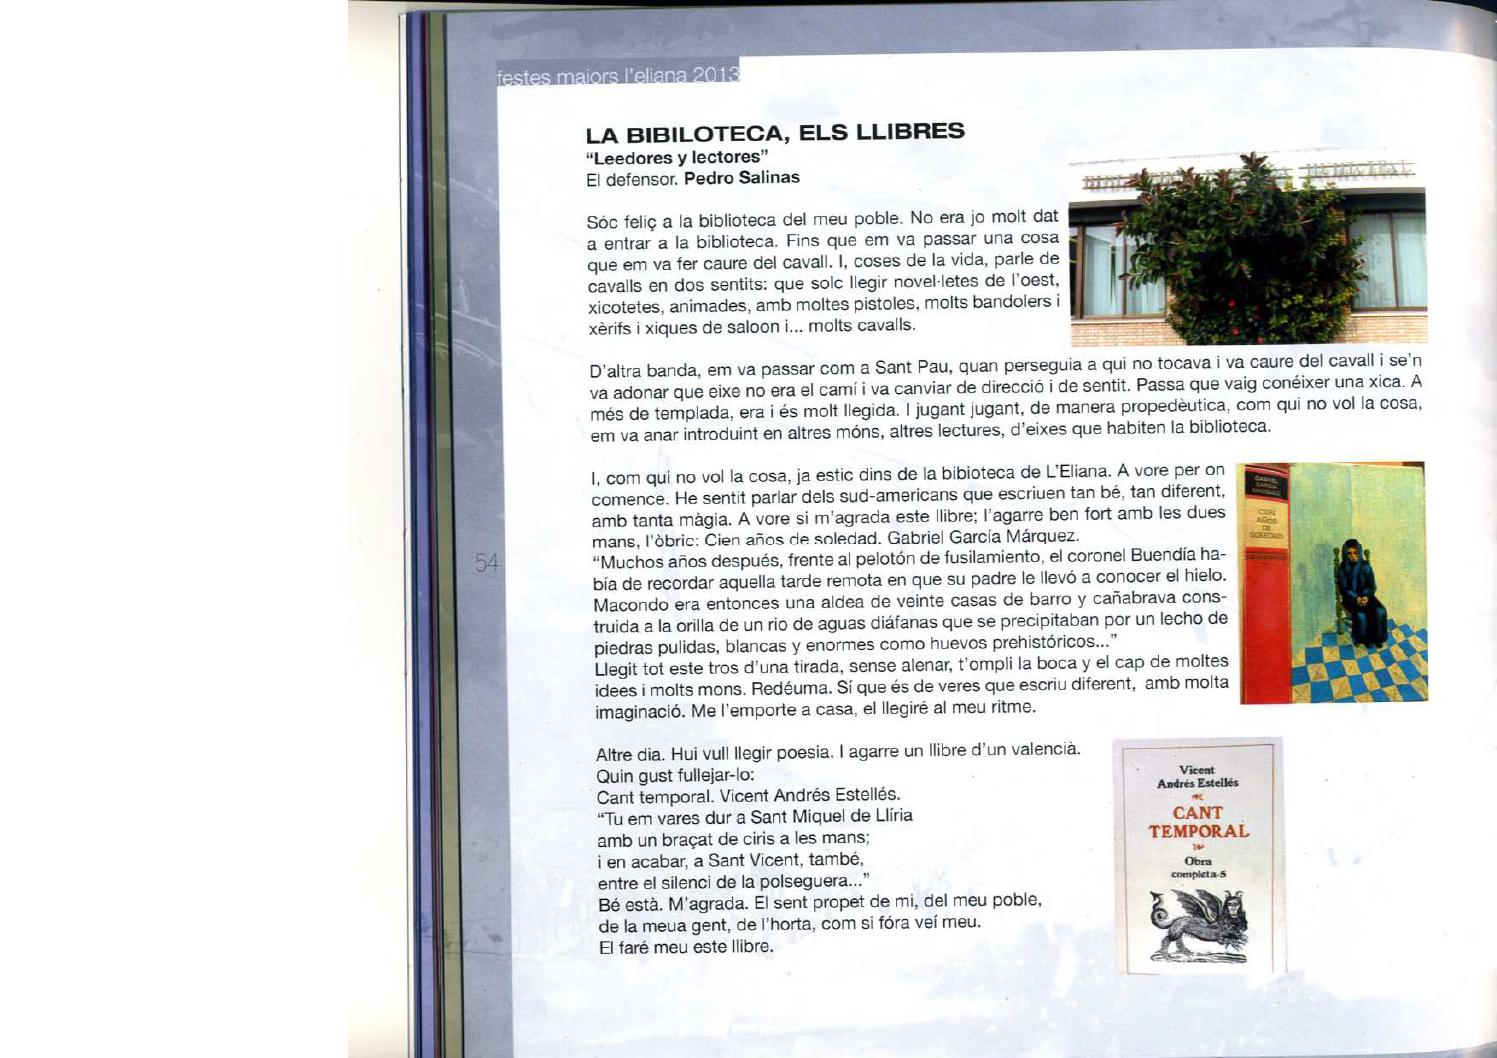 La biblioteca els llibres by biblioteca l 39 eliana issuu - Biblioteca l eliana ...